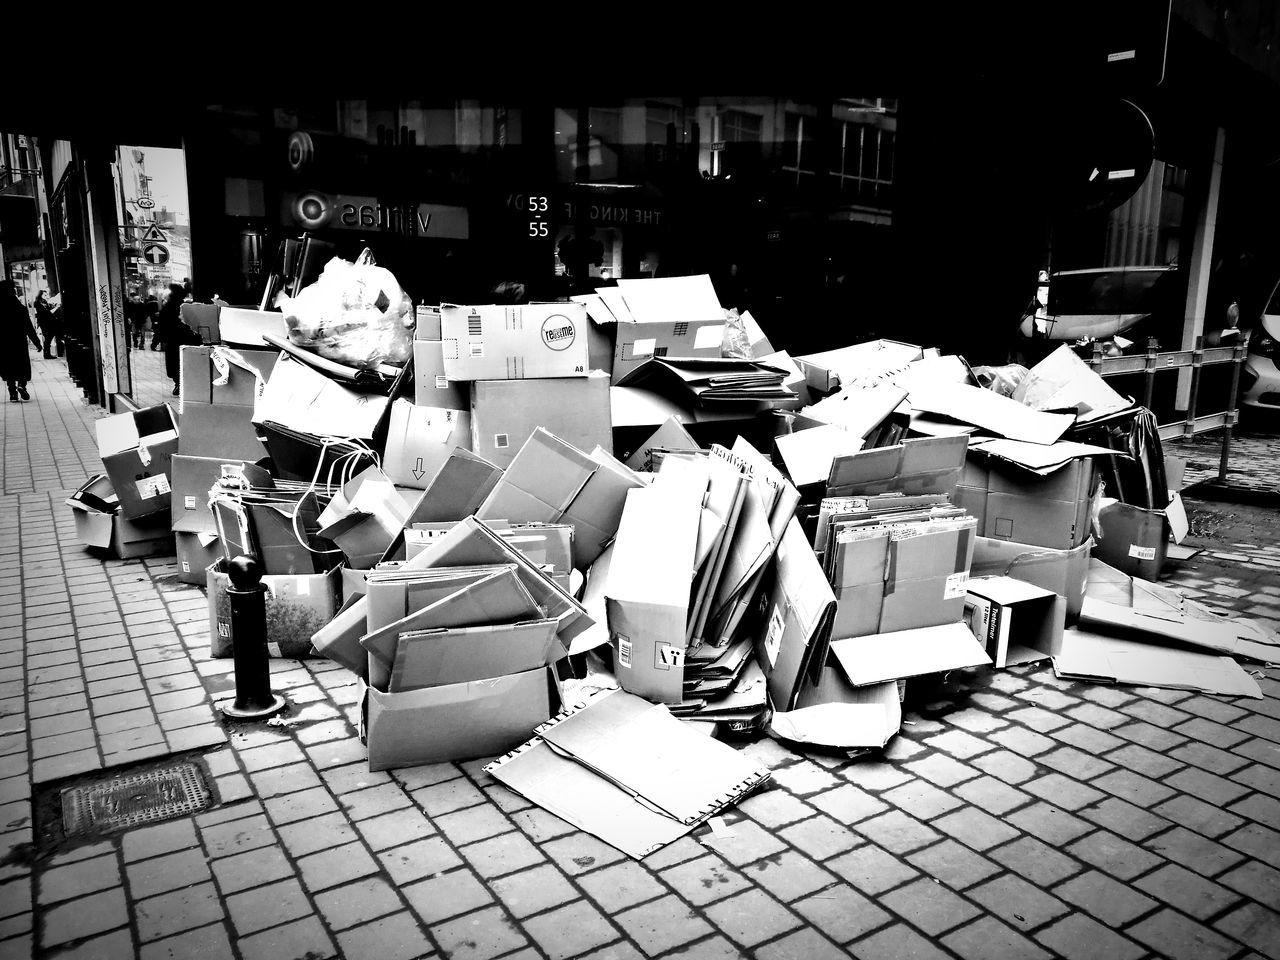 Carton Carton Box Huaweiphotography Huaweiphotography HuaweiP9 HuaweiP9 Huawei P9 Leica Bruxelles ❤ Streetphotography City Ixelles Porte De Namur Black & White Photography Ordures Société De Consommation